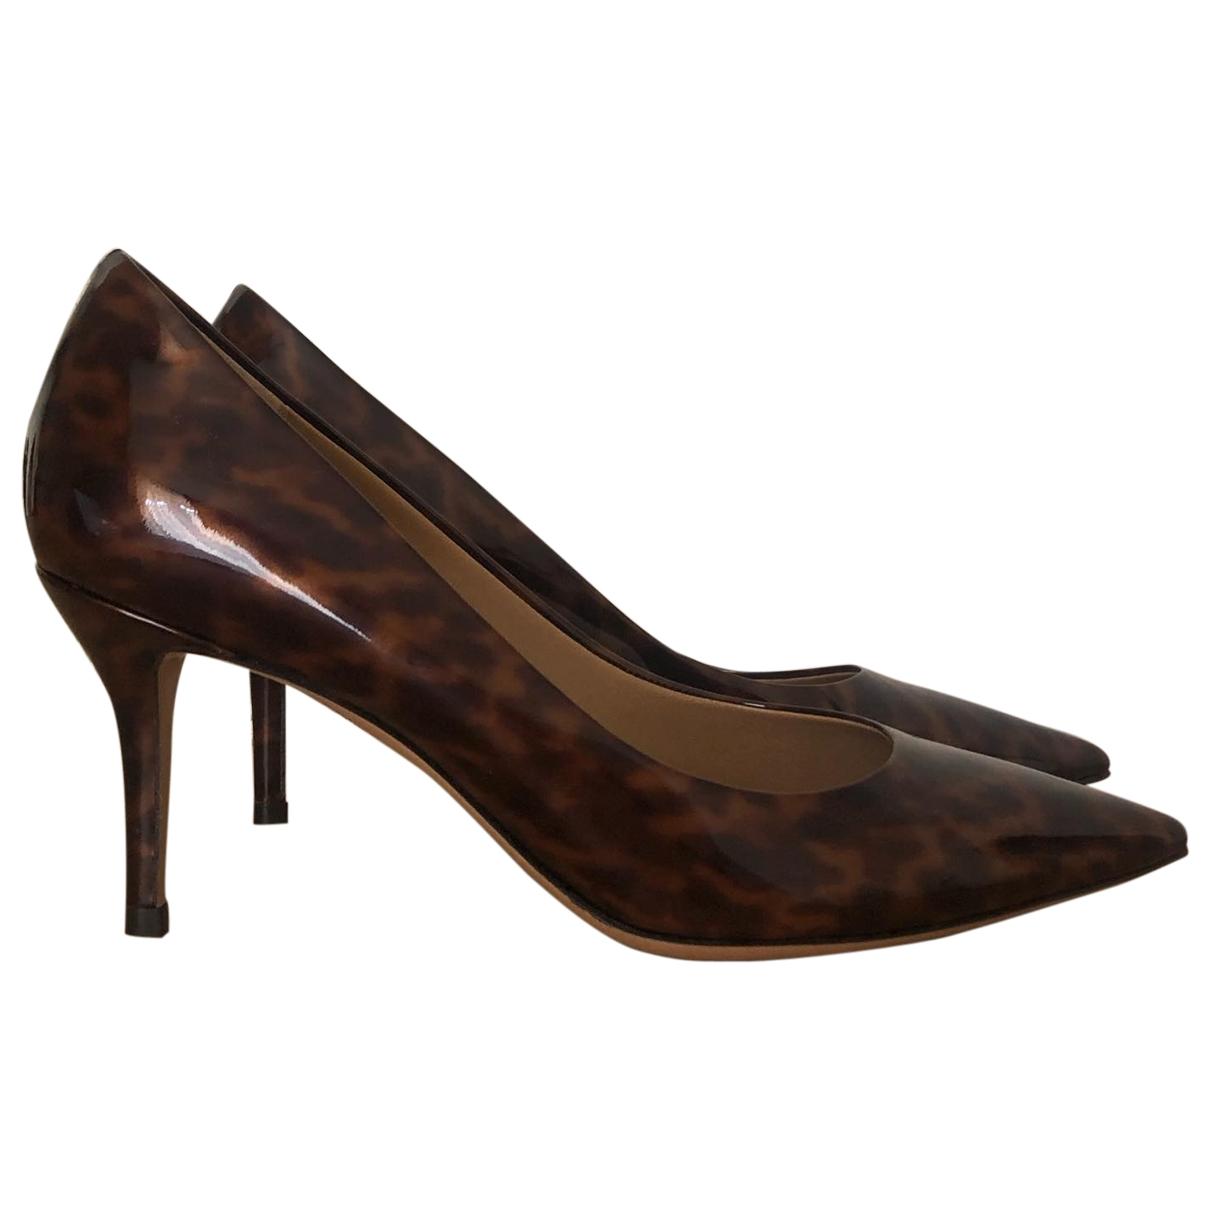 Salvatore Ferragamo \N Brown Patent leather Heels for Women 36.5 EU